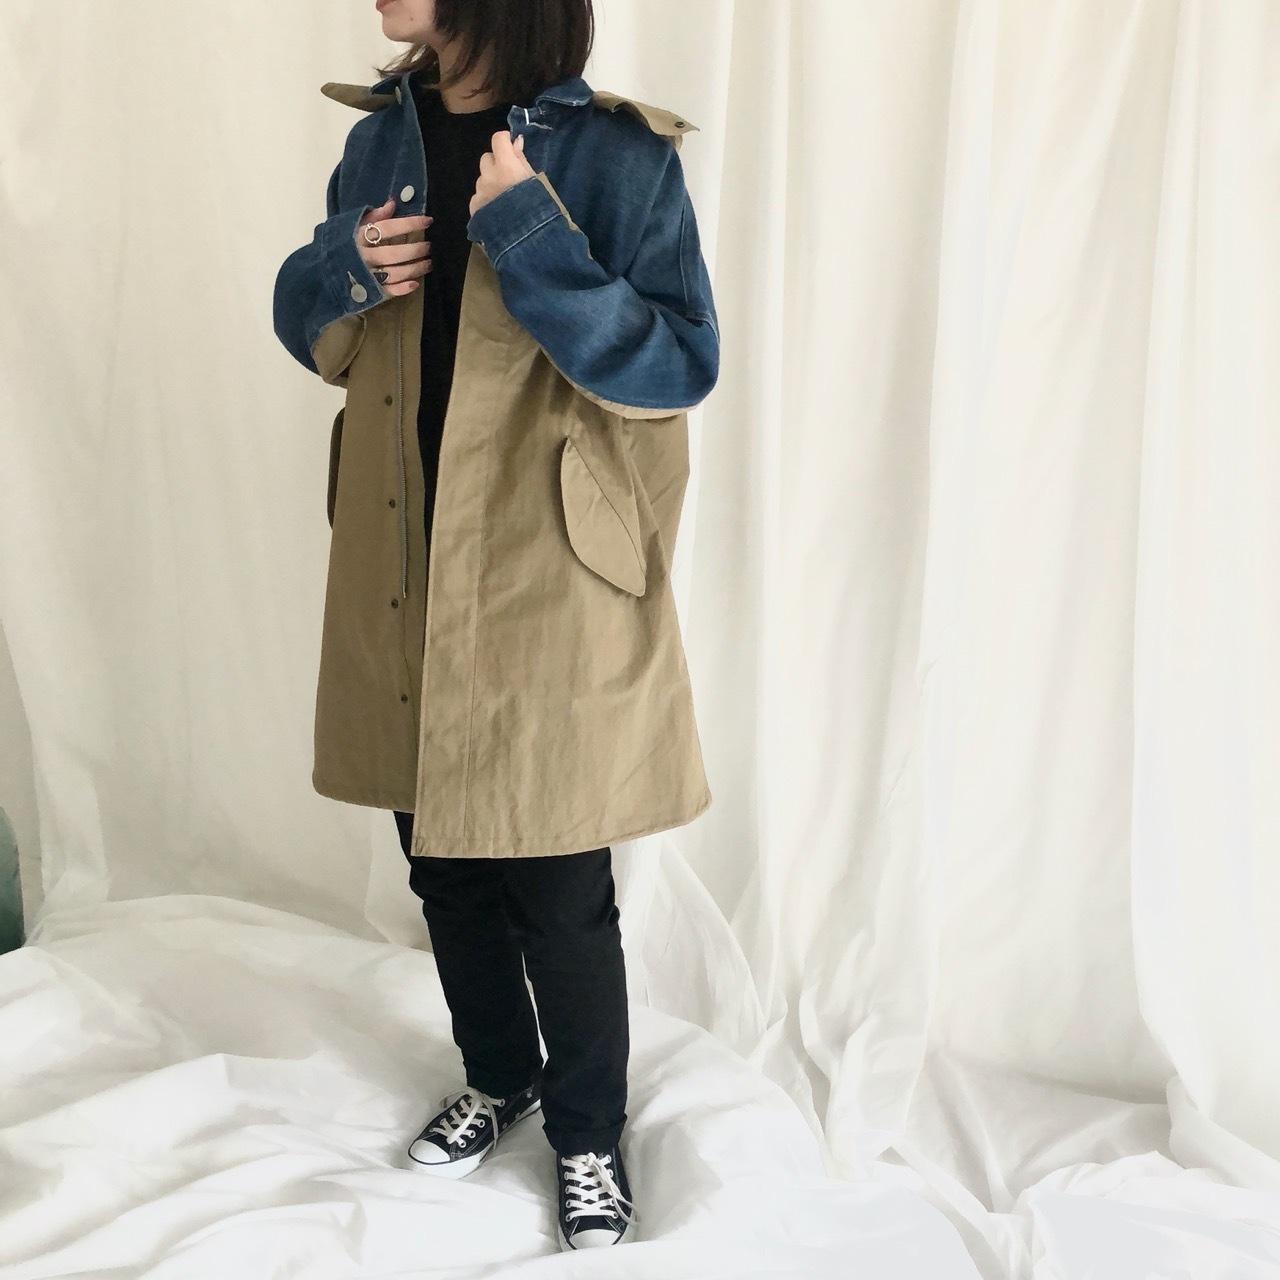 【 ANTGAUGE 】- AA636 - 切替モッズコート